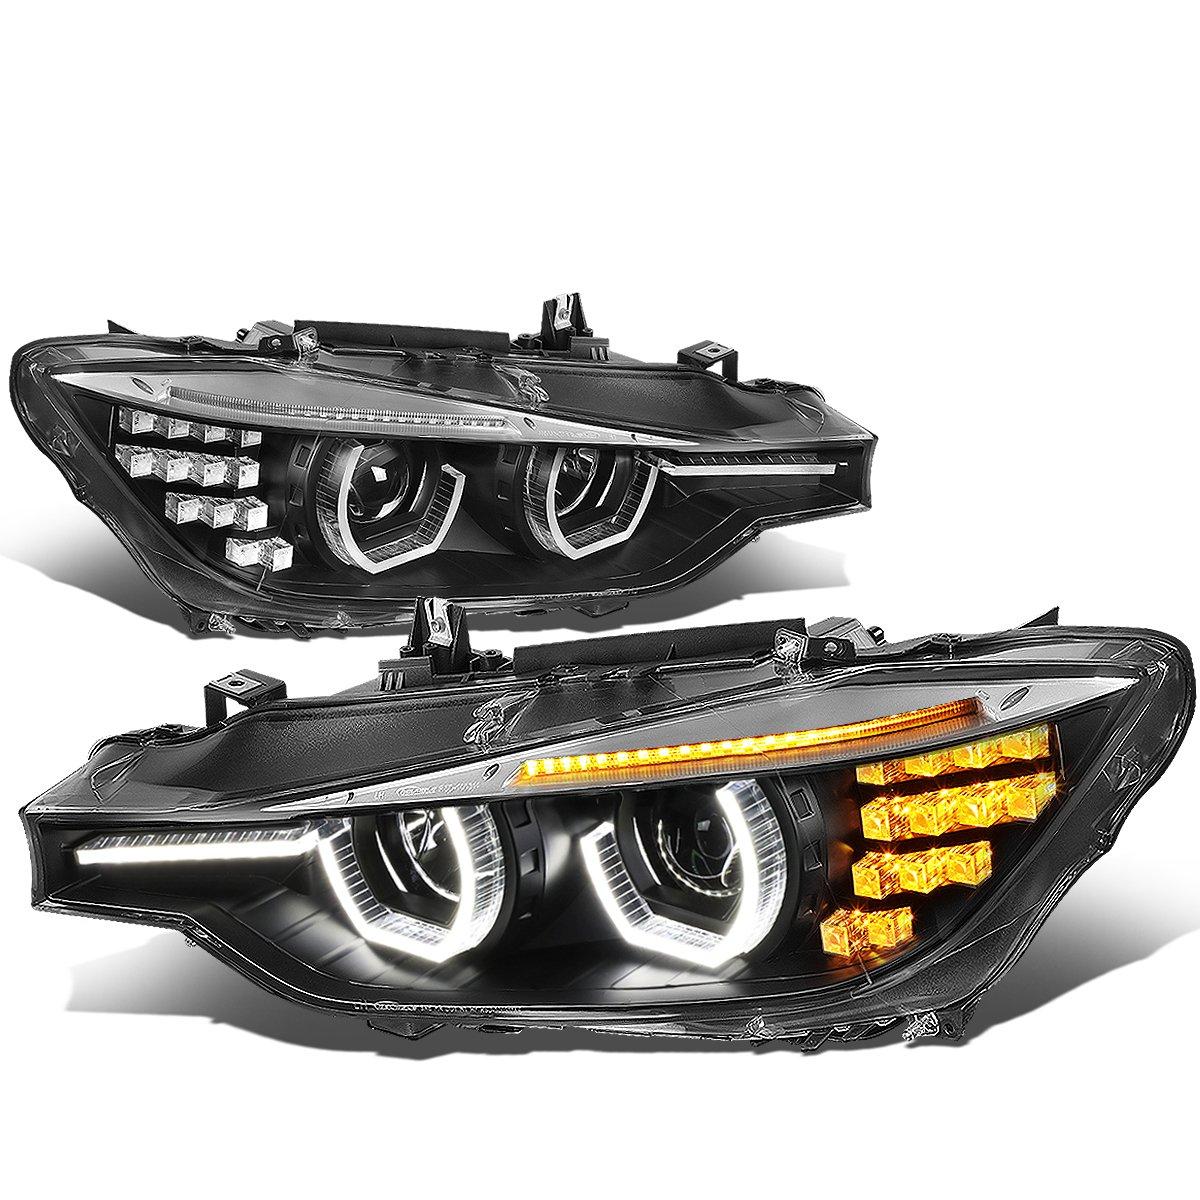 For BMW F30 3-Series Sedan Wagon Black Housing Amber Signal LED DRL U-Halo  Projector Headlight